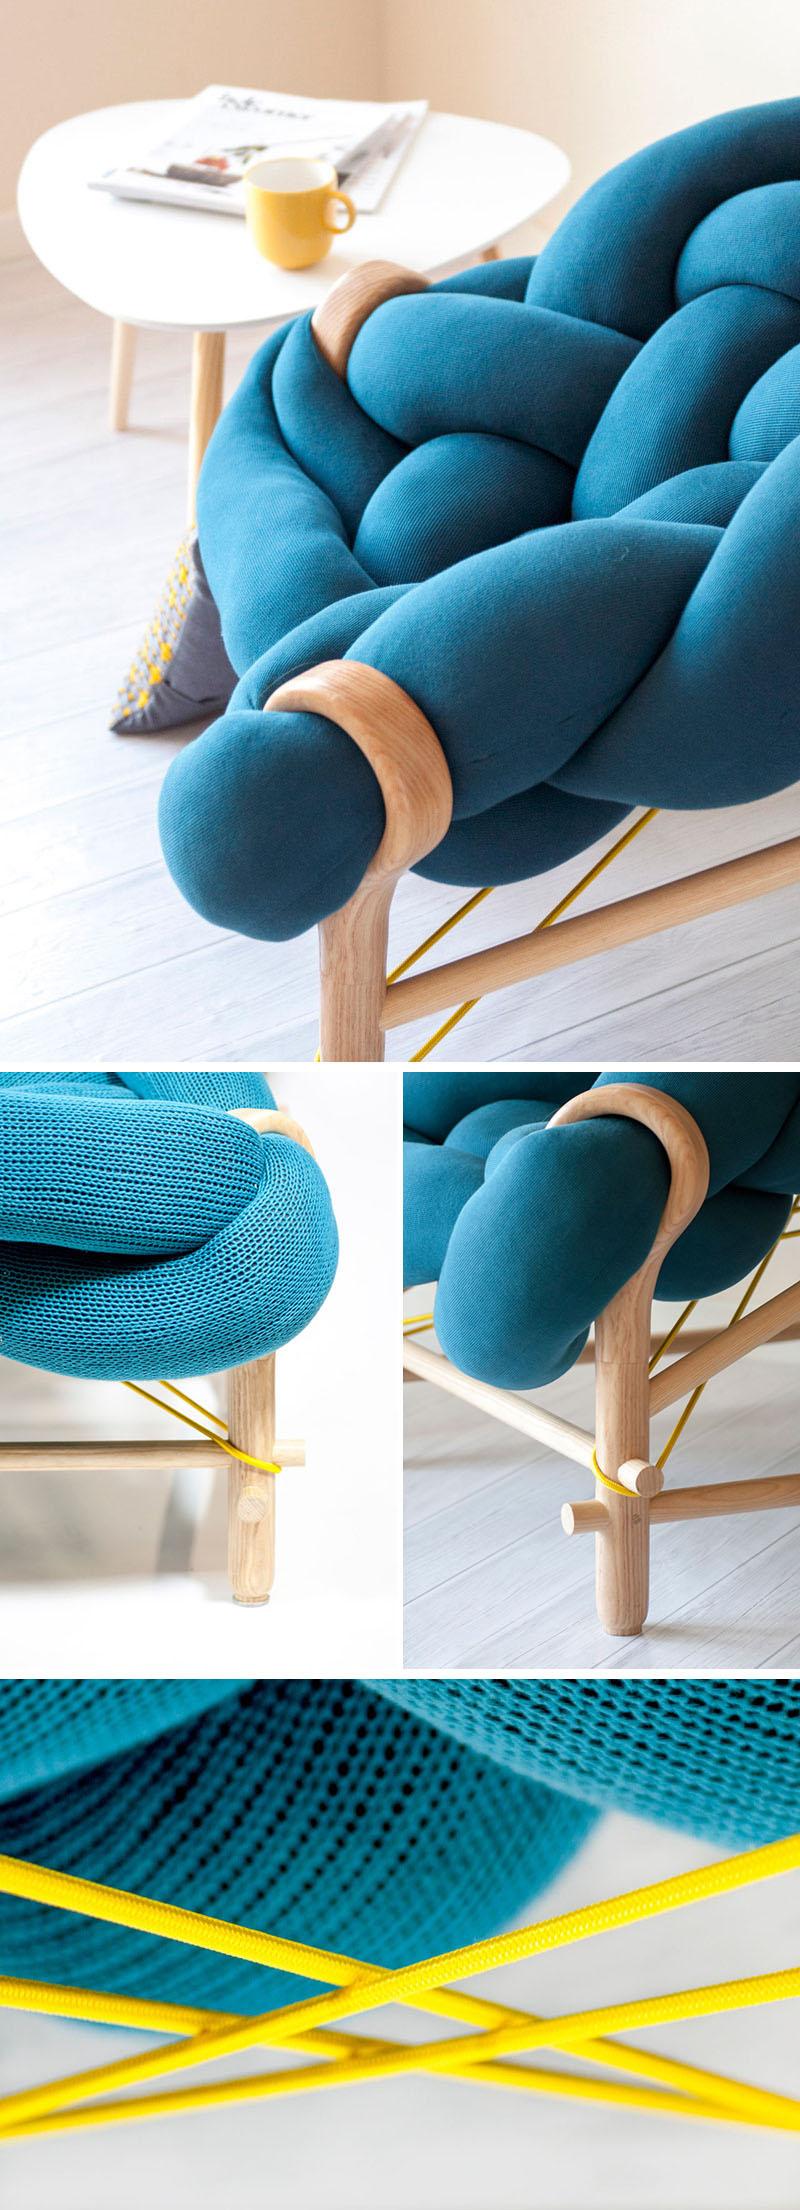 contemporary-furniture-design-171216-904-03